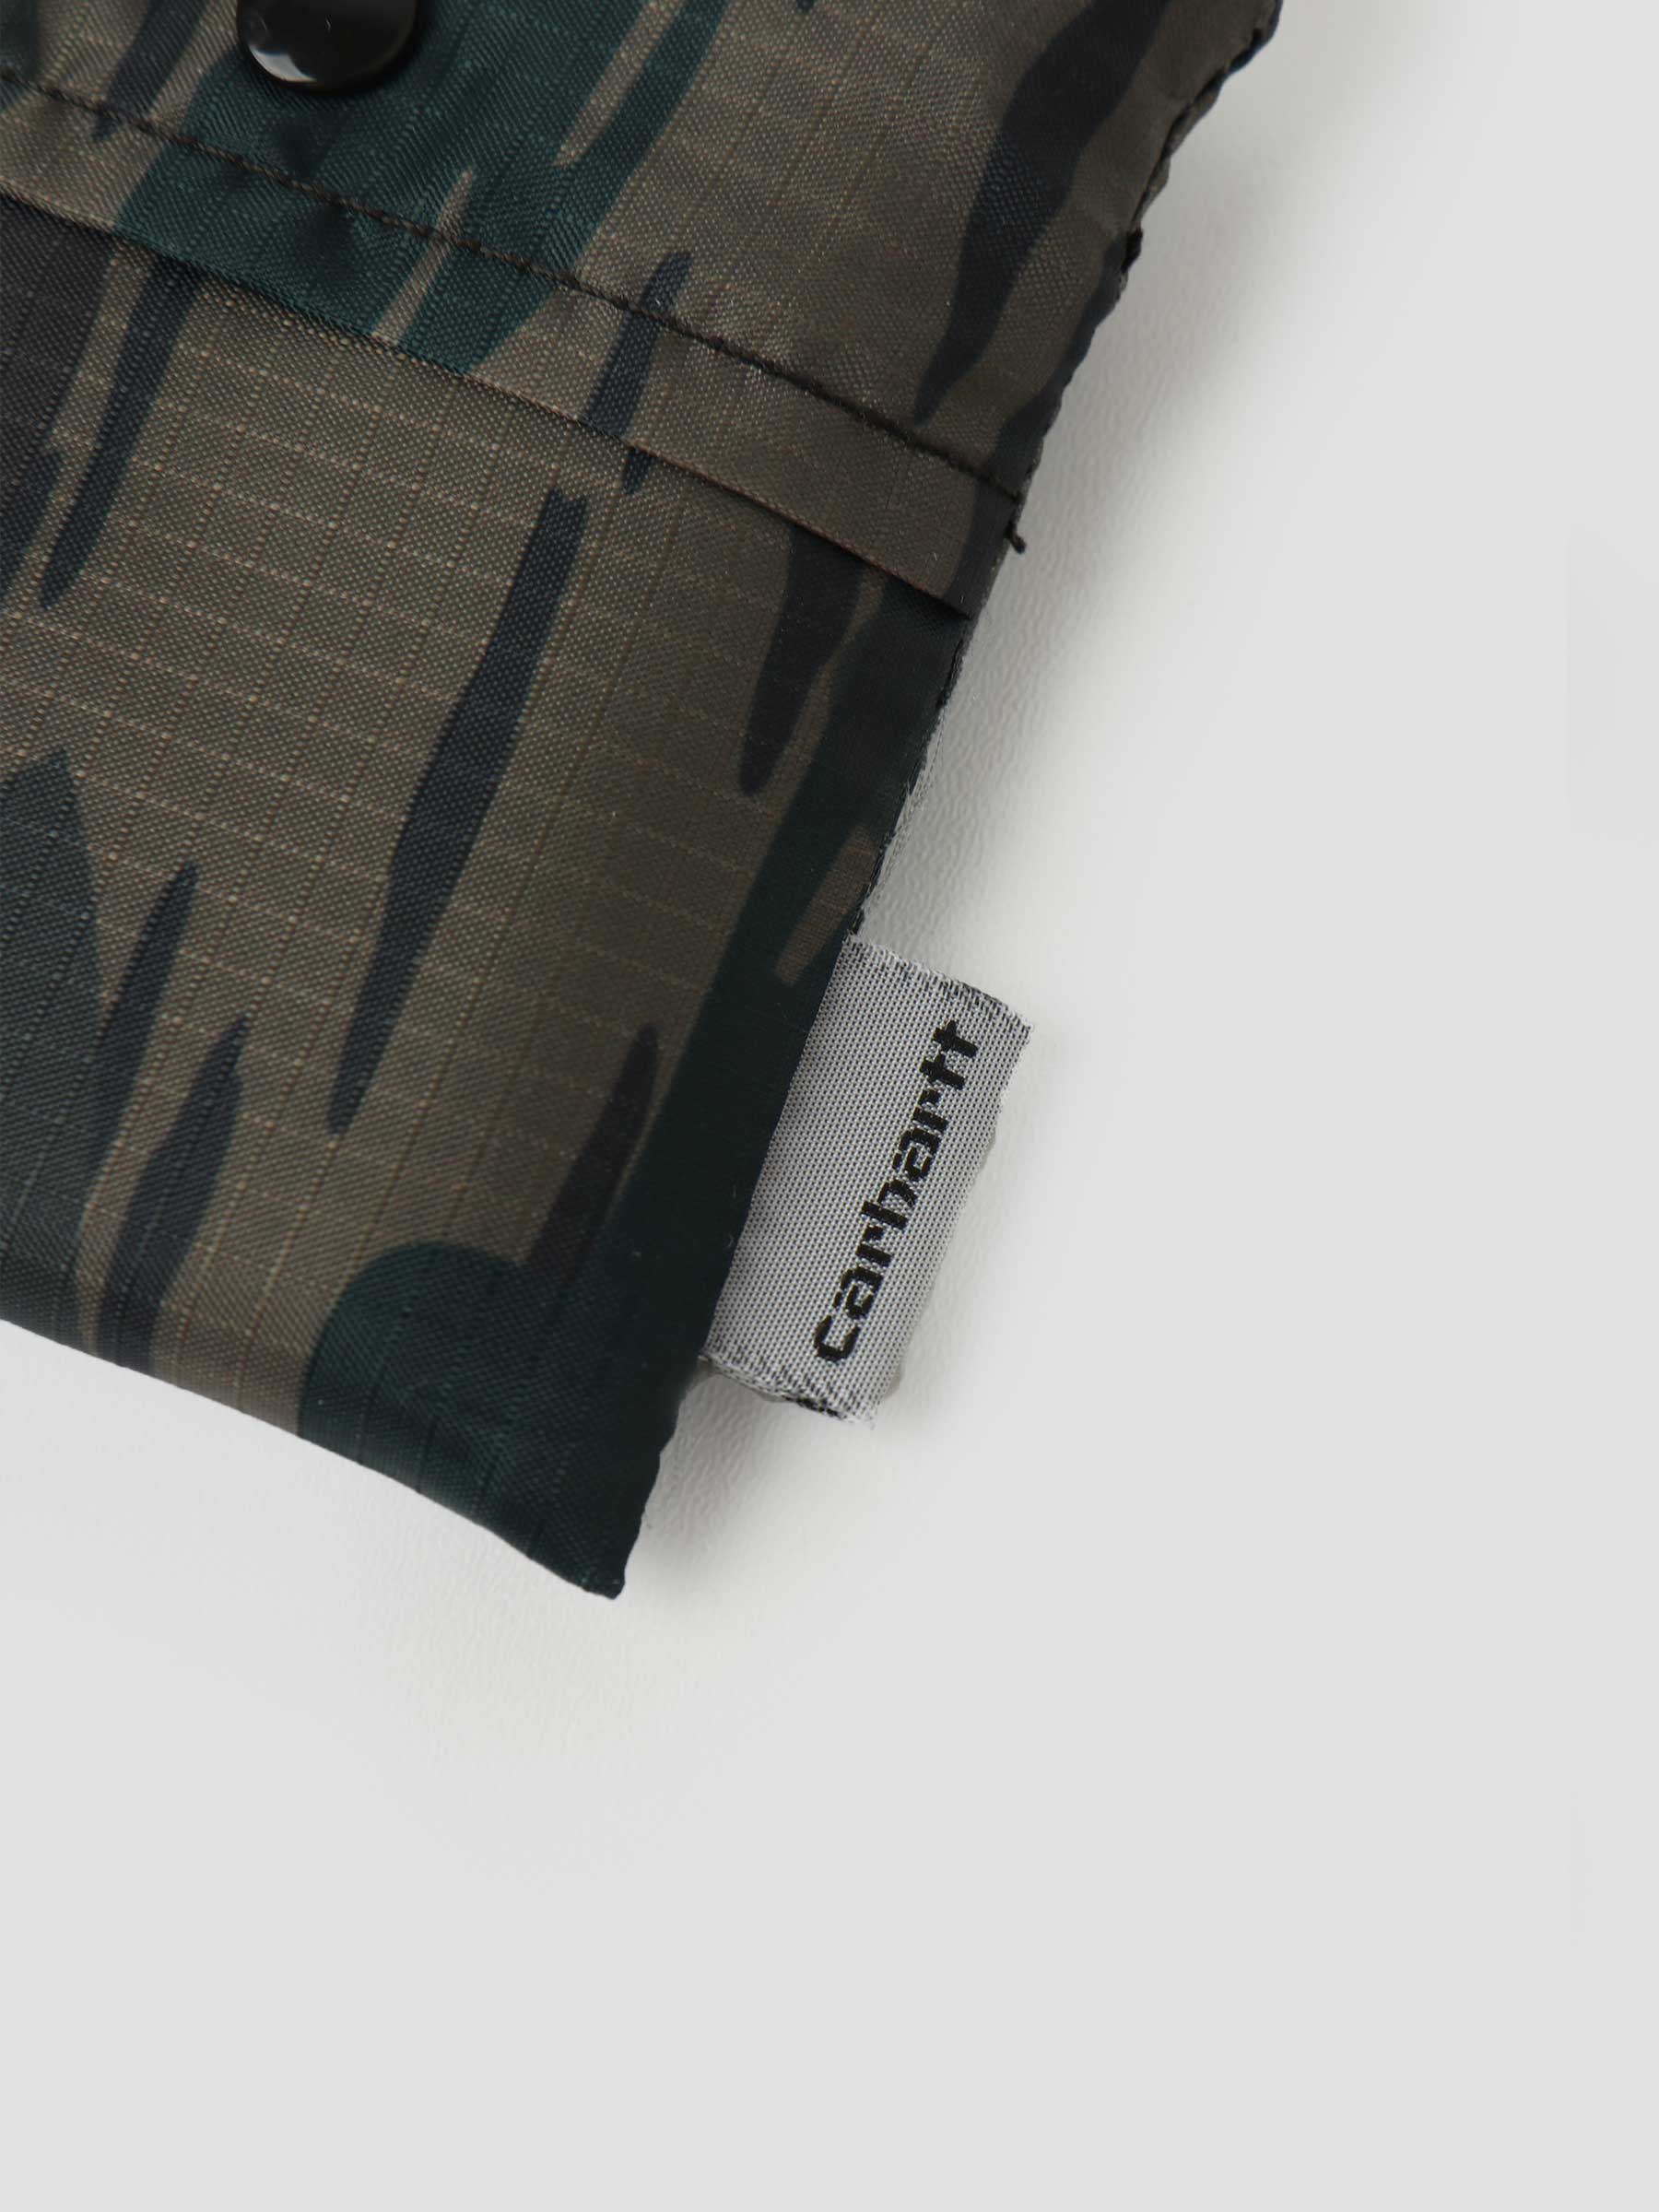 Keychain Shopping Bag Camo Unite Copperton I029920